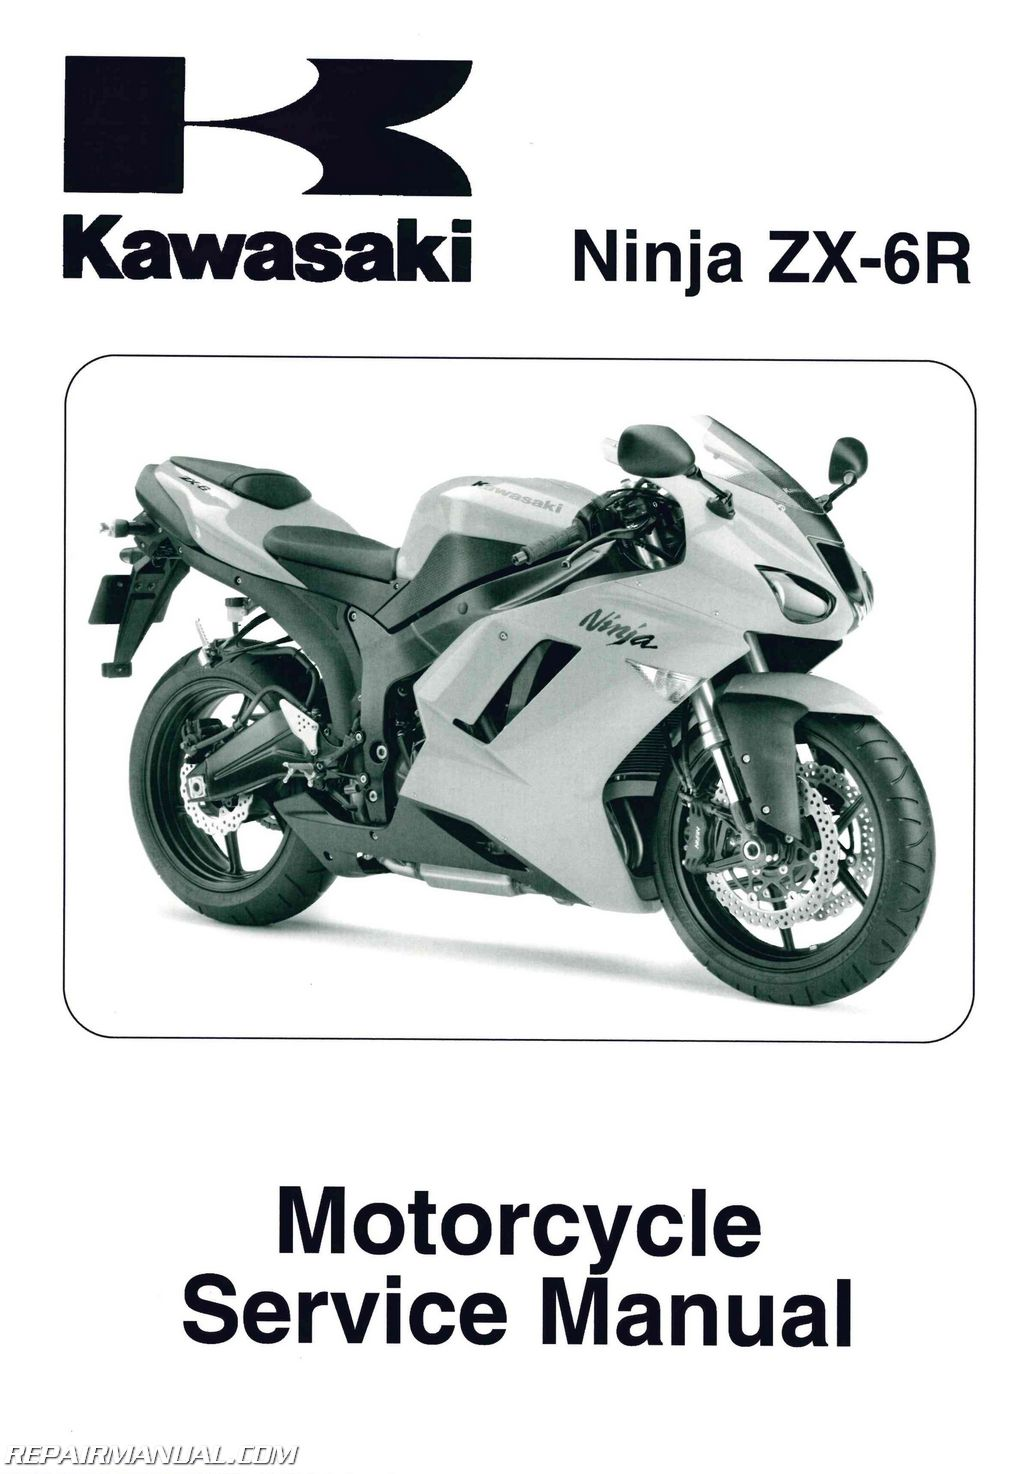 2007 2008 kawasaki ninja zx 6r zx600p motorcycle service manual rh repairmanual com 07 Zx6r Parts 2007 kawasaki zx6r owners manual